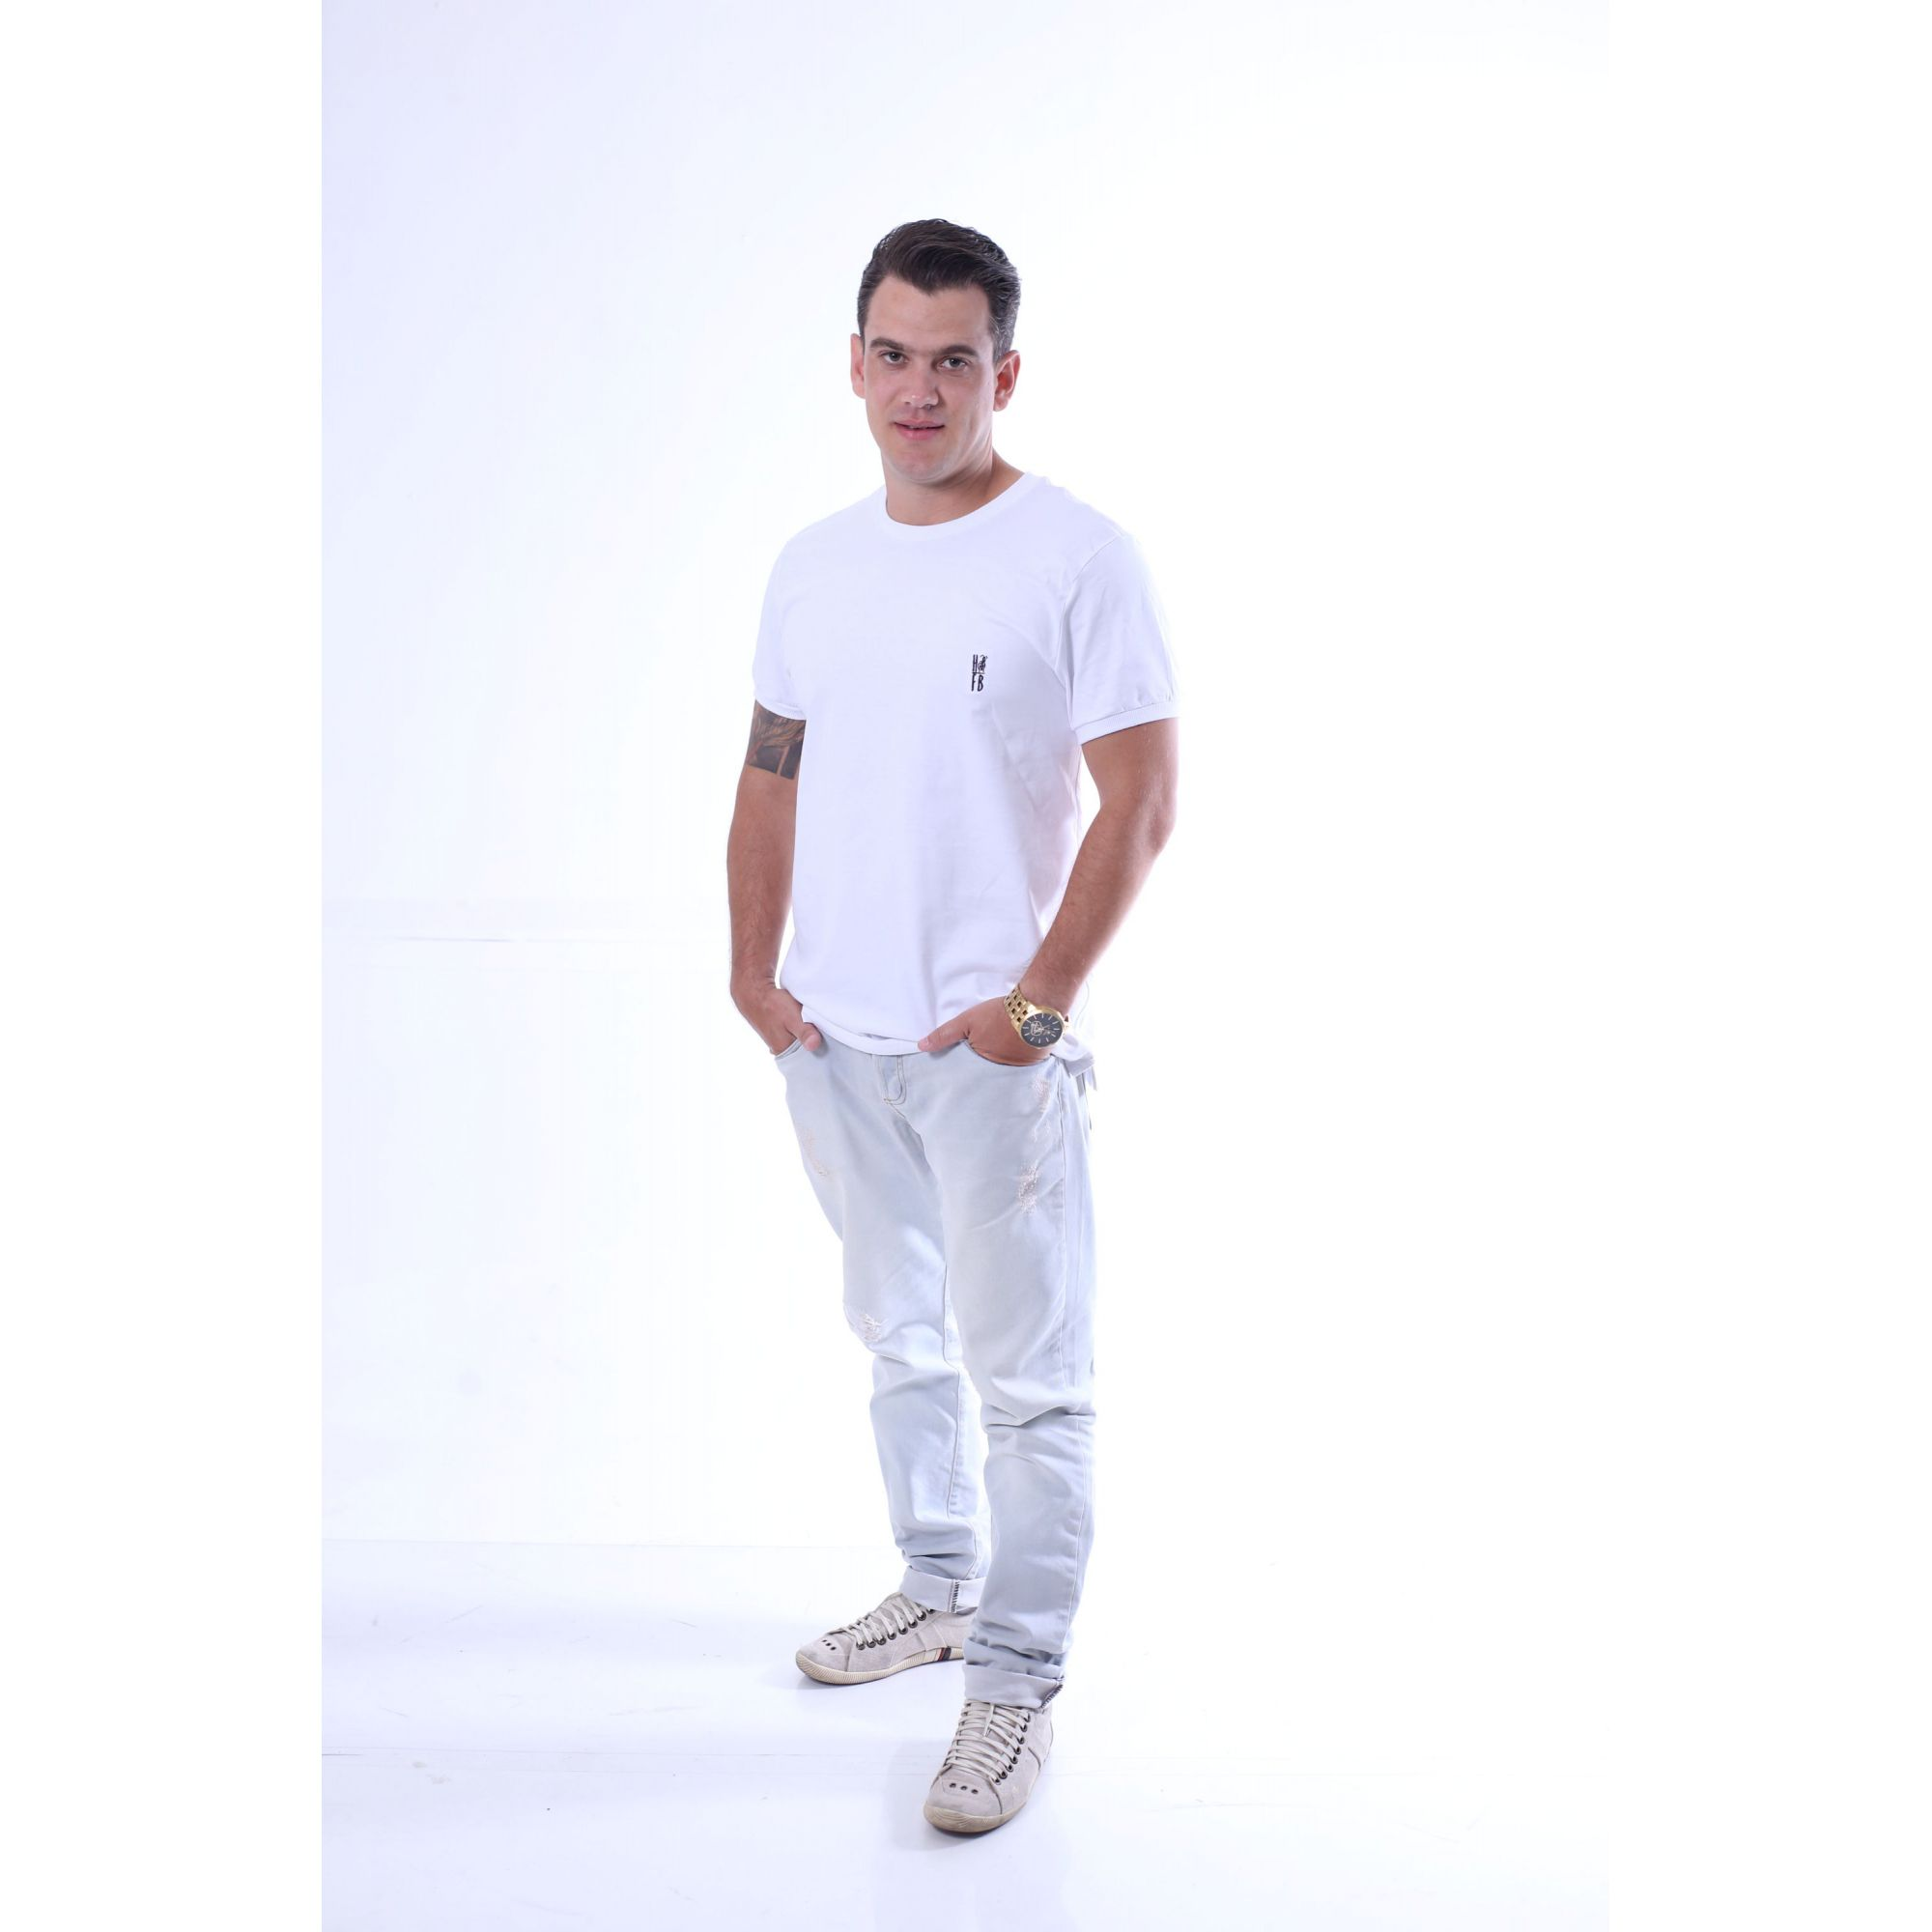 Camiseta Branca Malha Menegotti - Premium  - Heitor Fashion Brazil